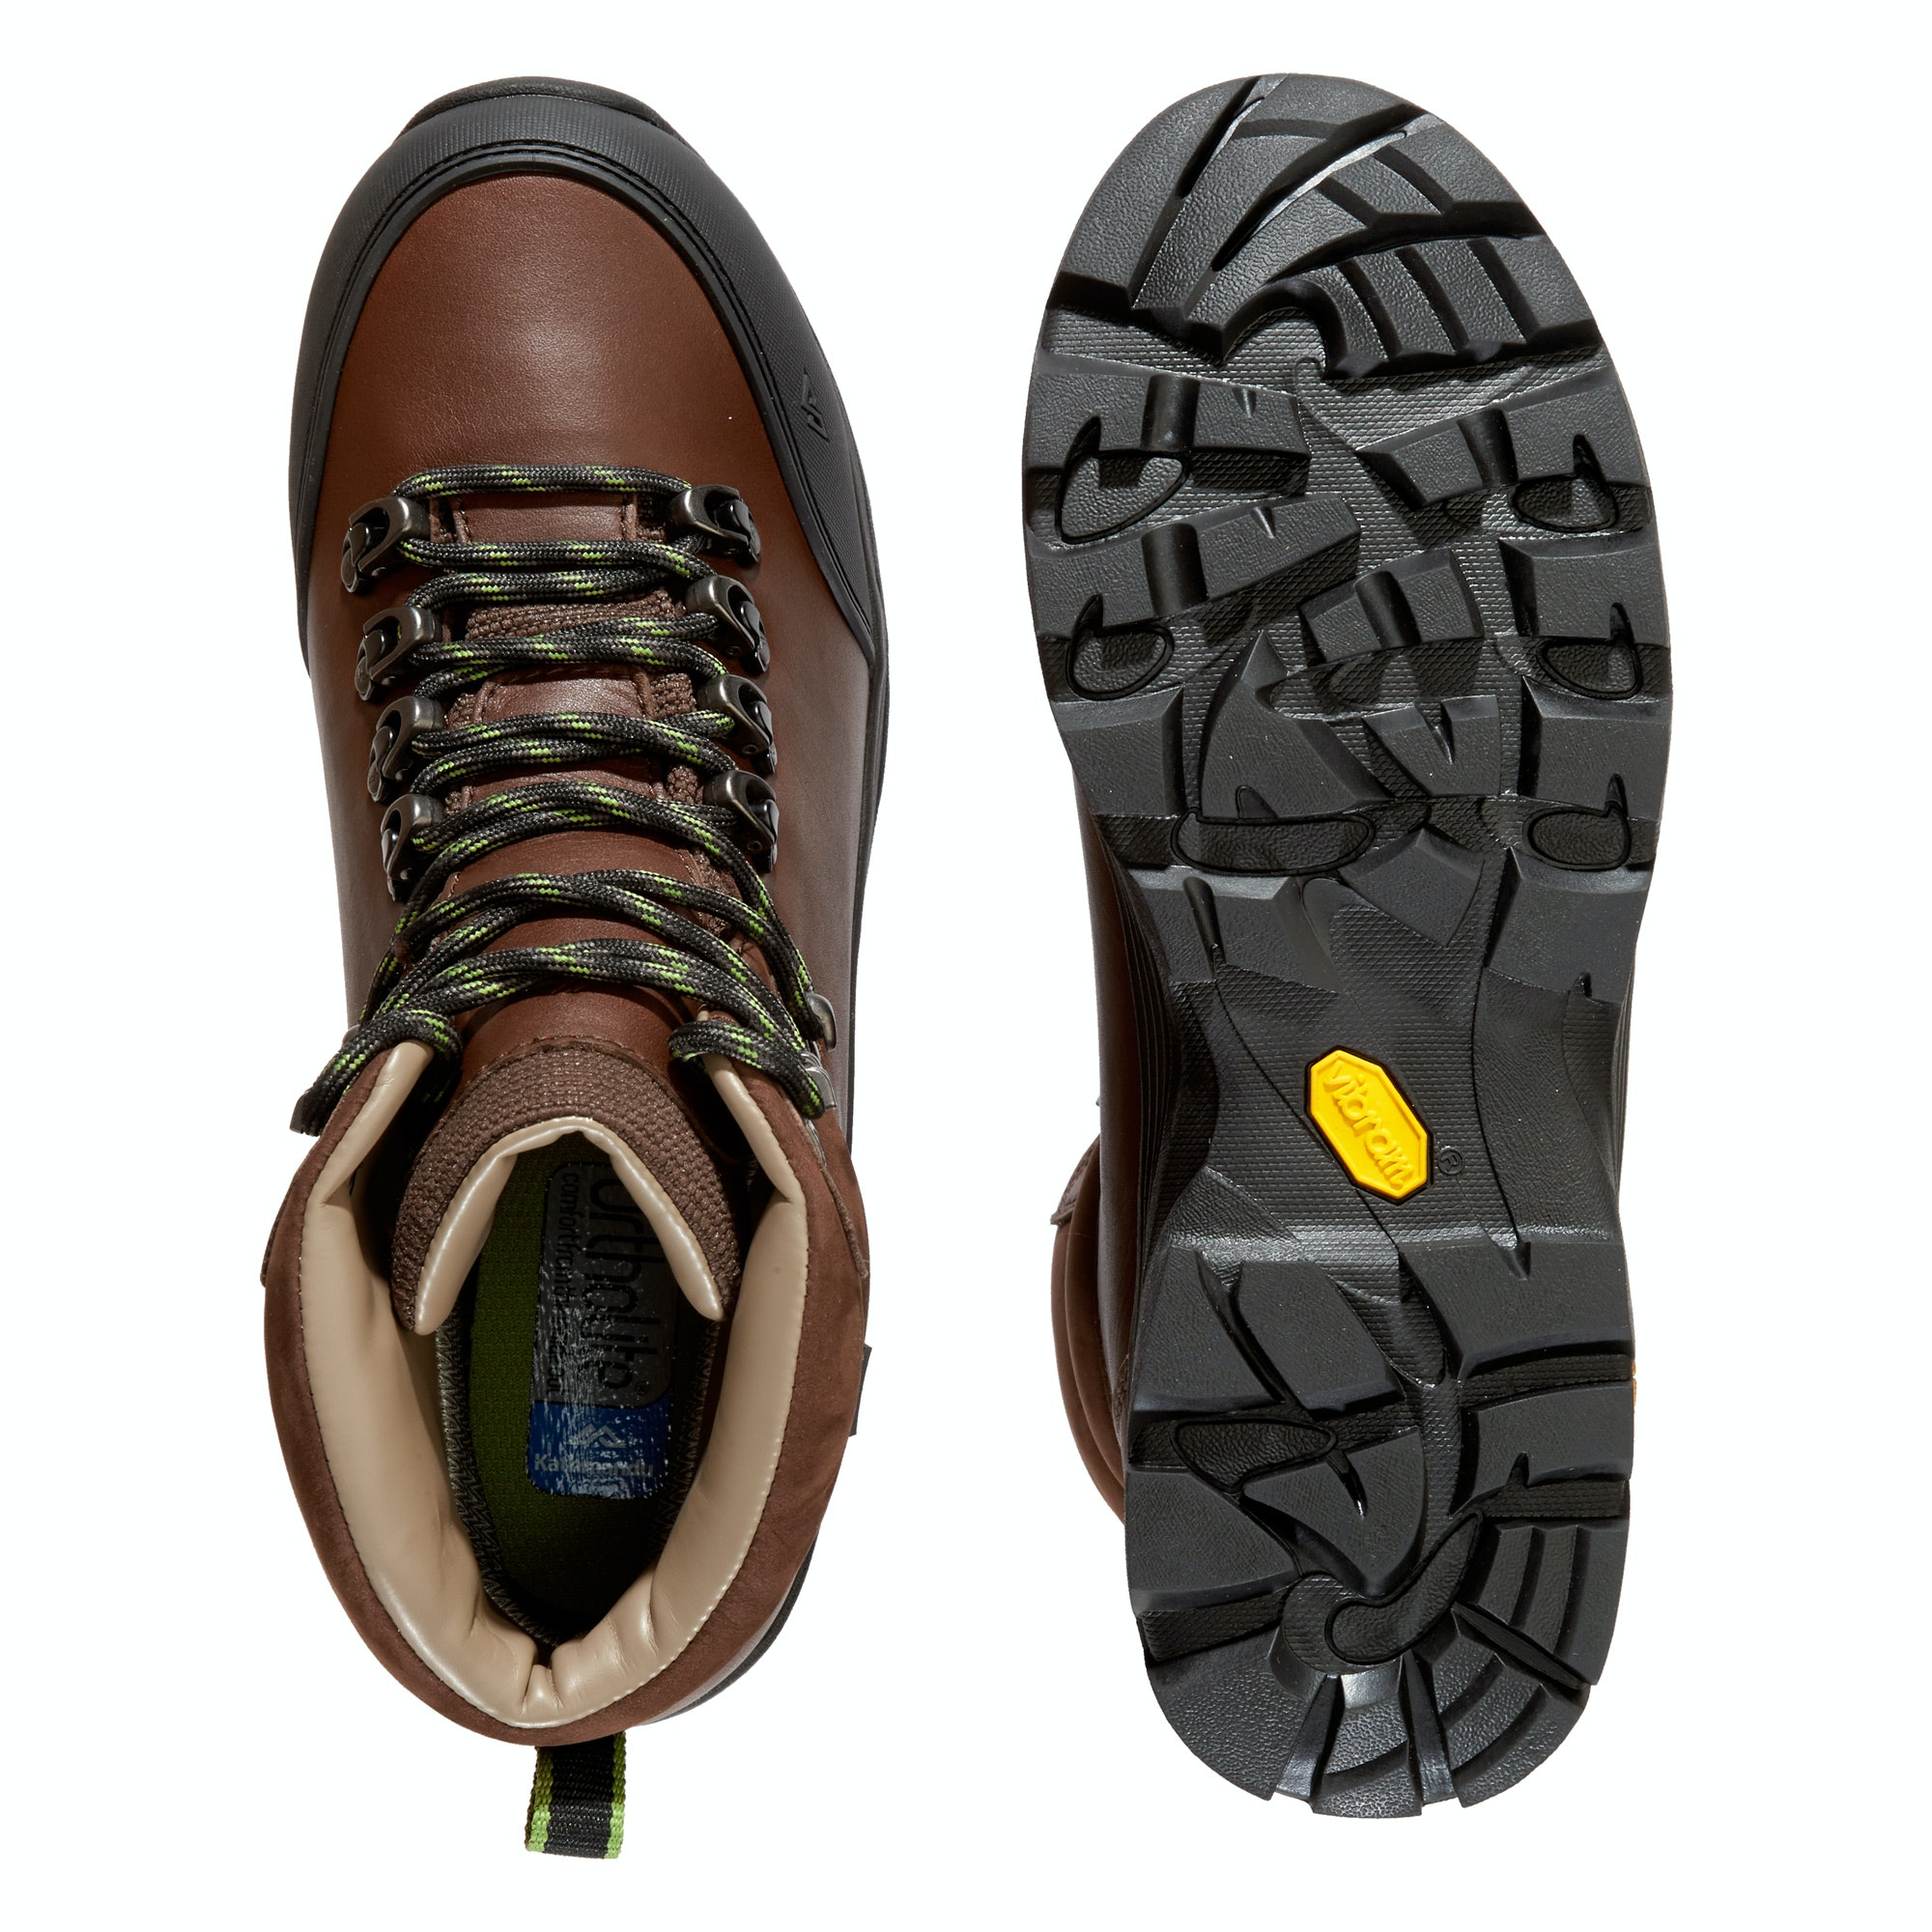 cc94509f39d Details about NEW Kathmandu Tiber Men's ngx Leather Hiking Boots